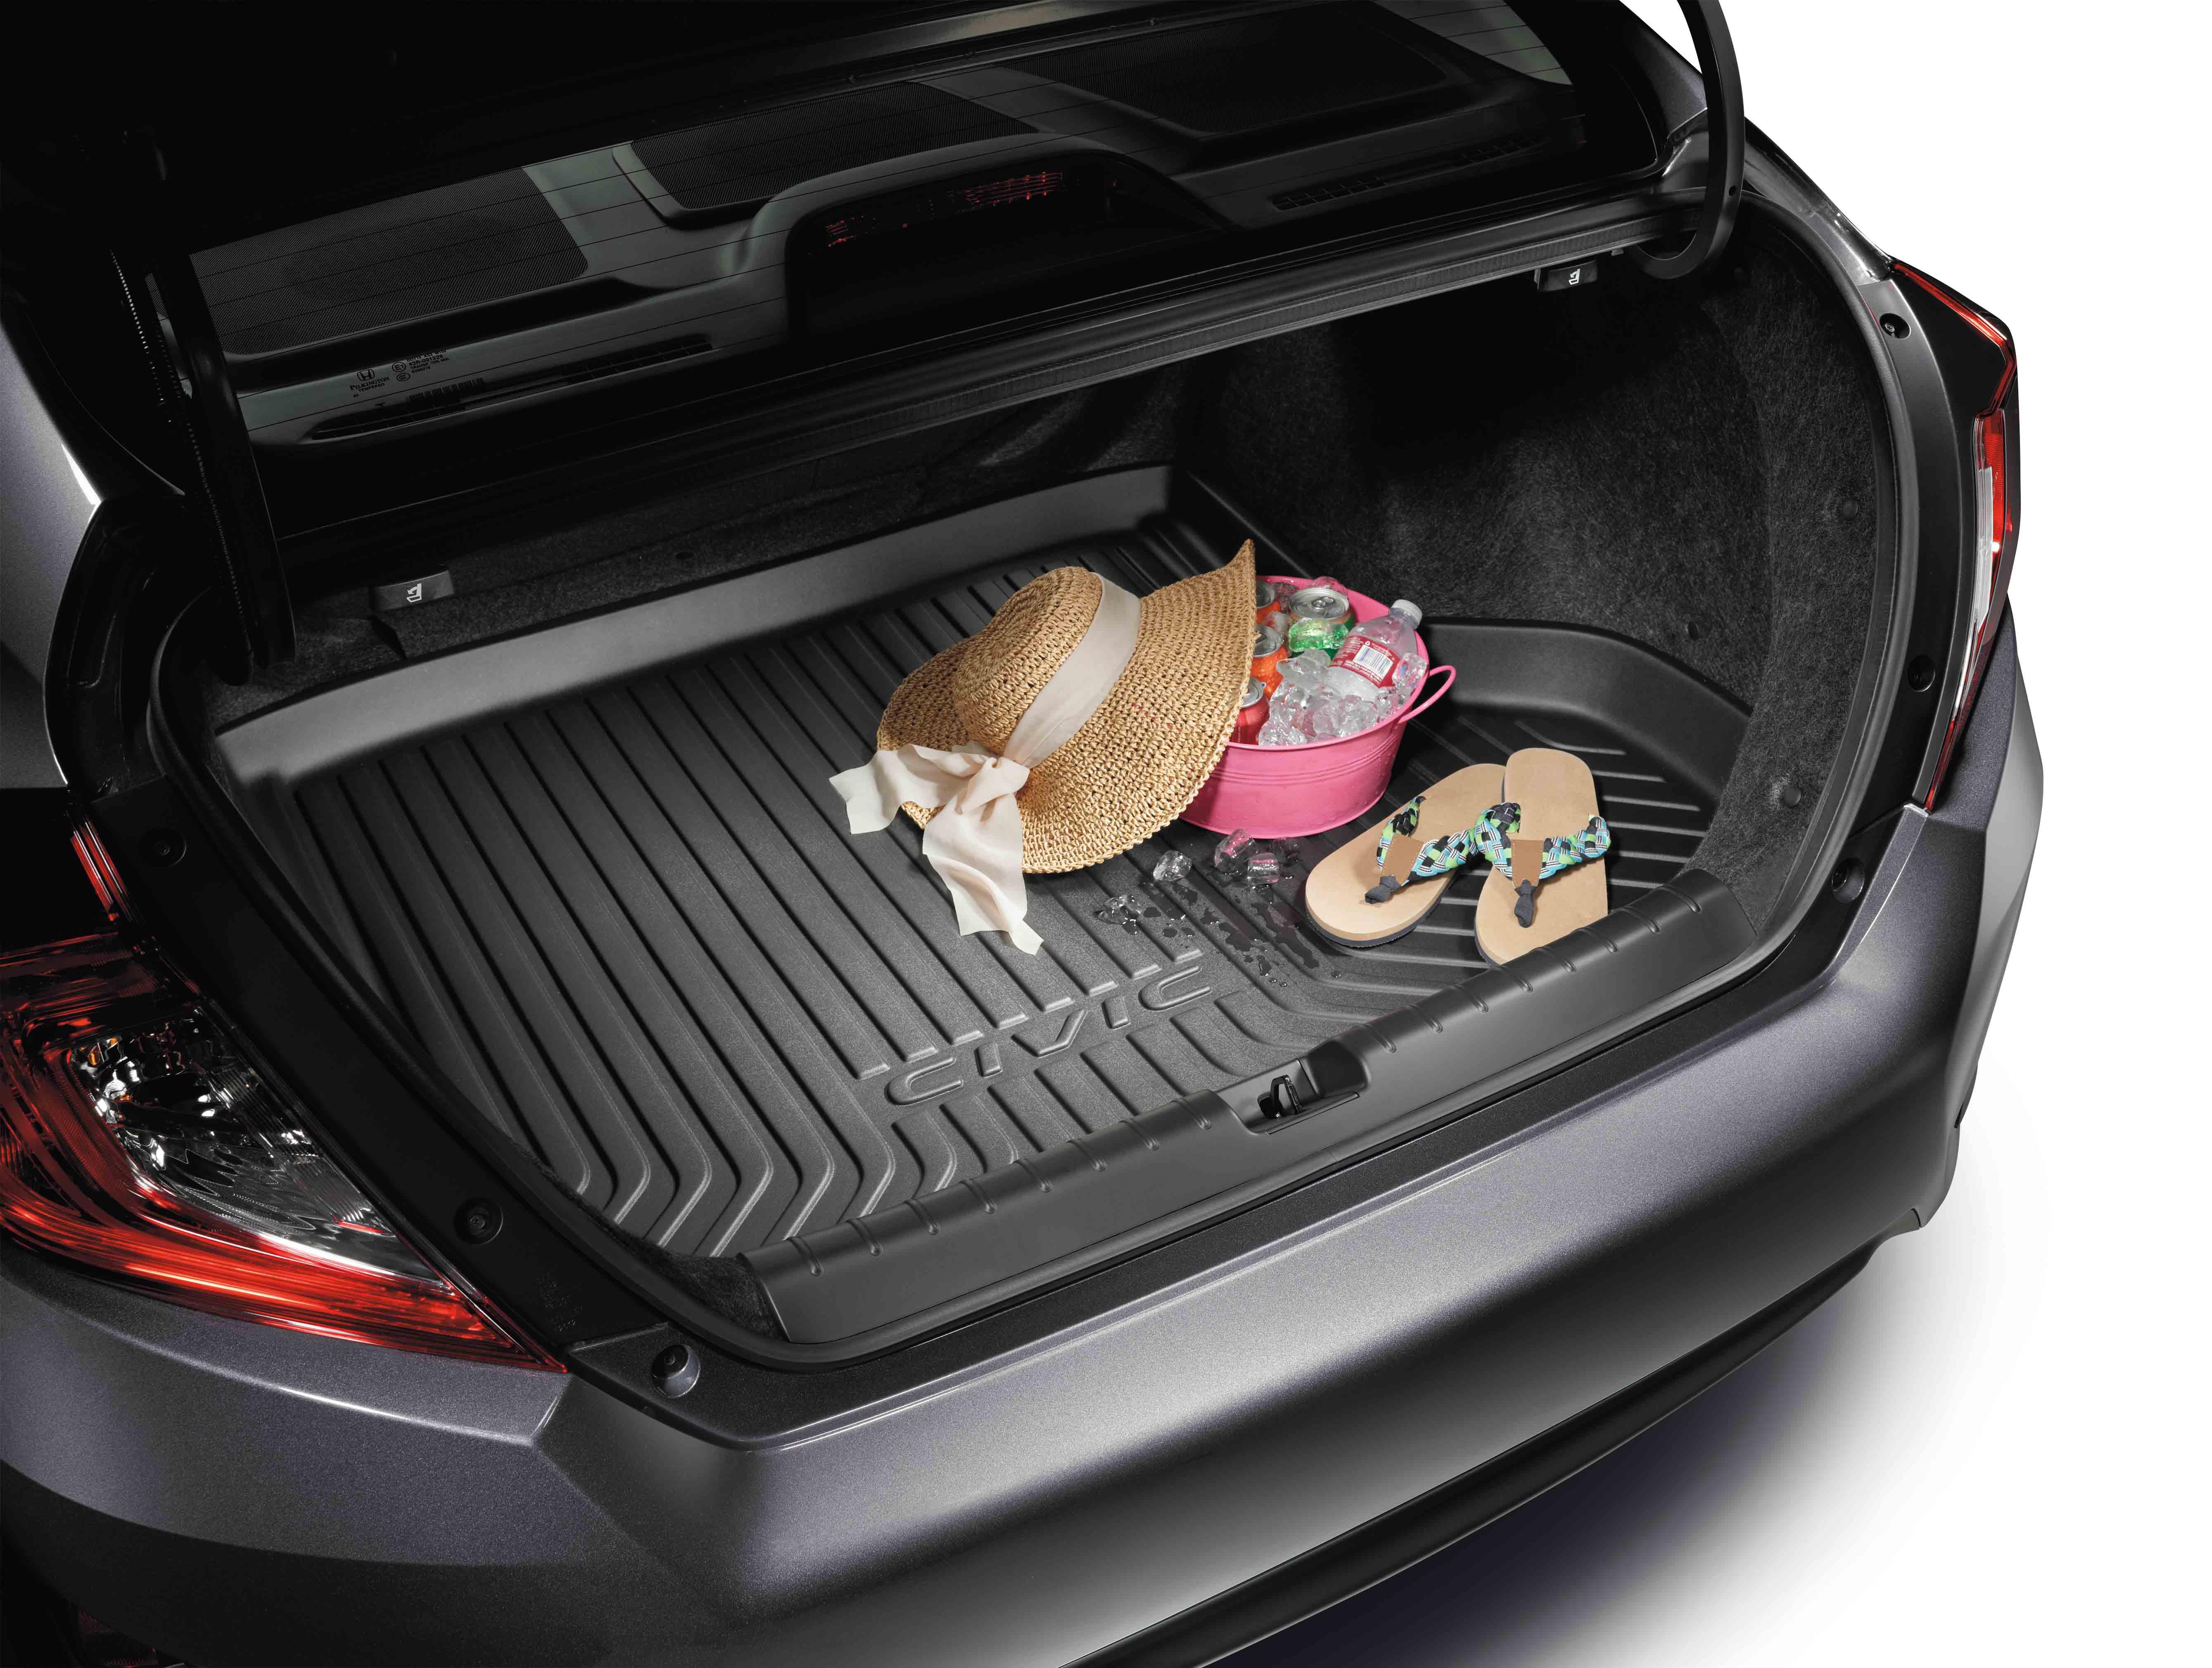 2016-2018 Honda Civic 4dr Trunk Tray - 08U45-TBA-100